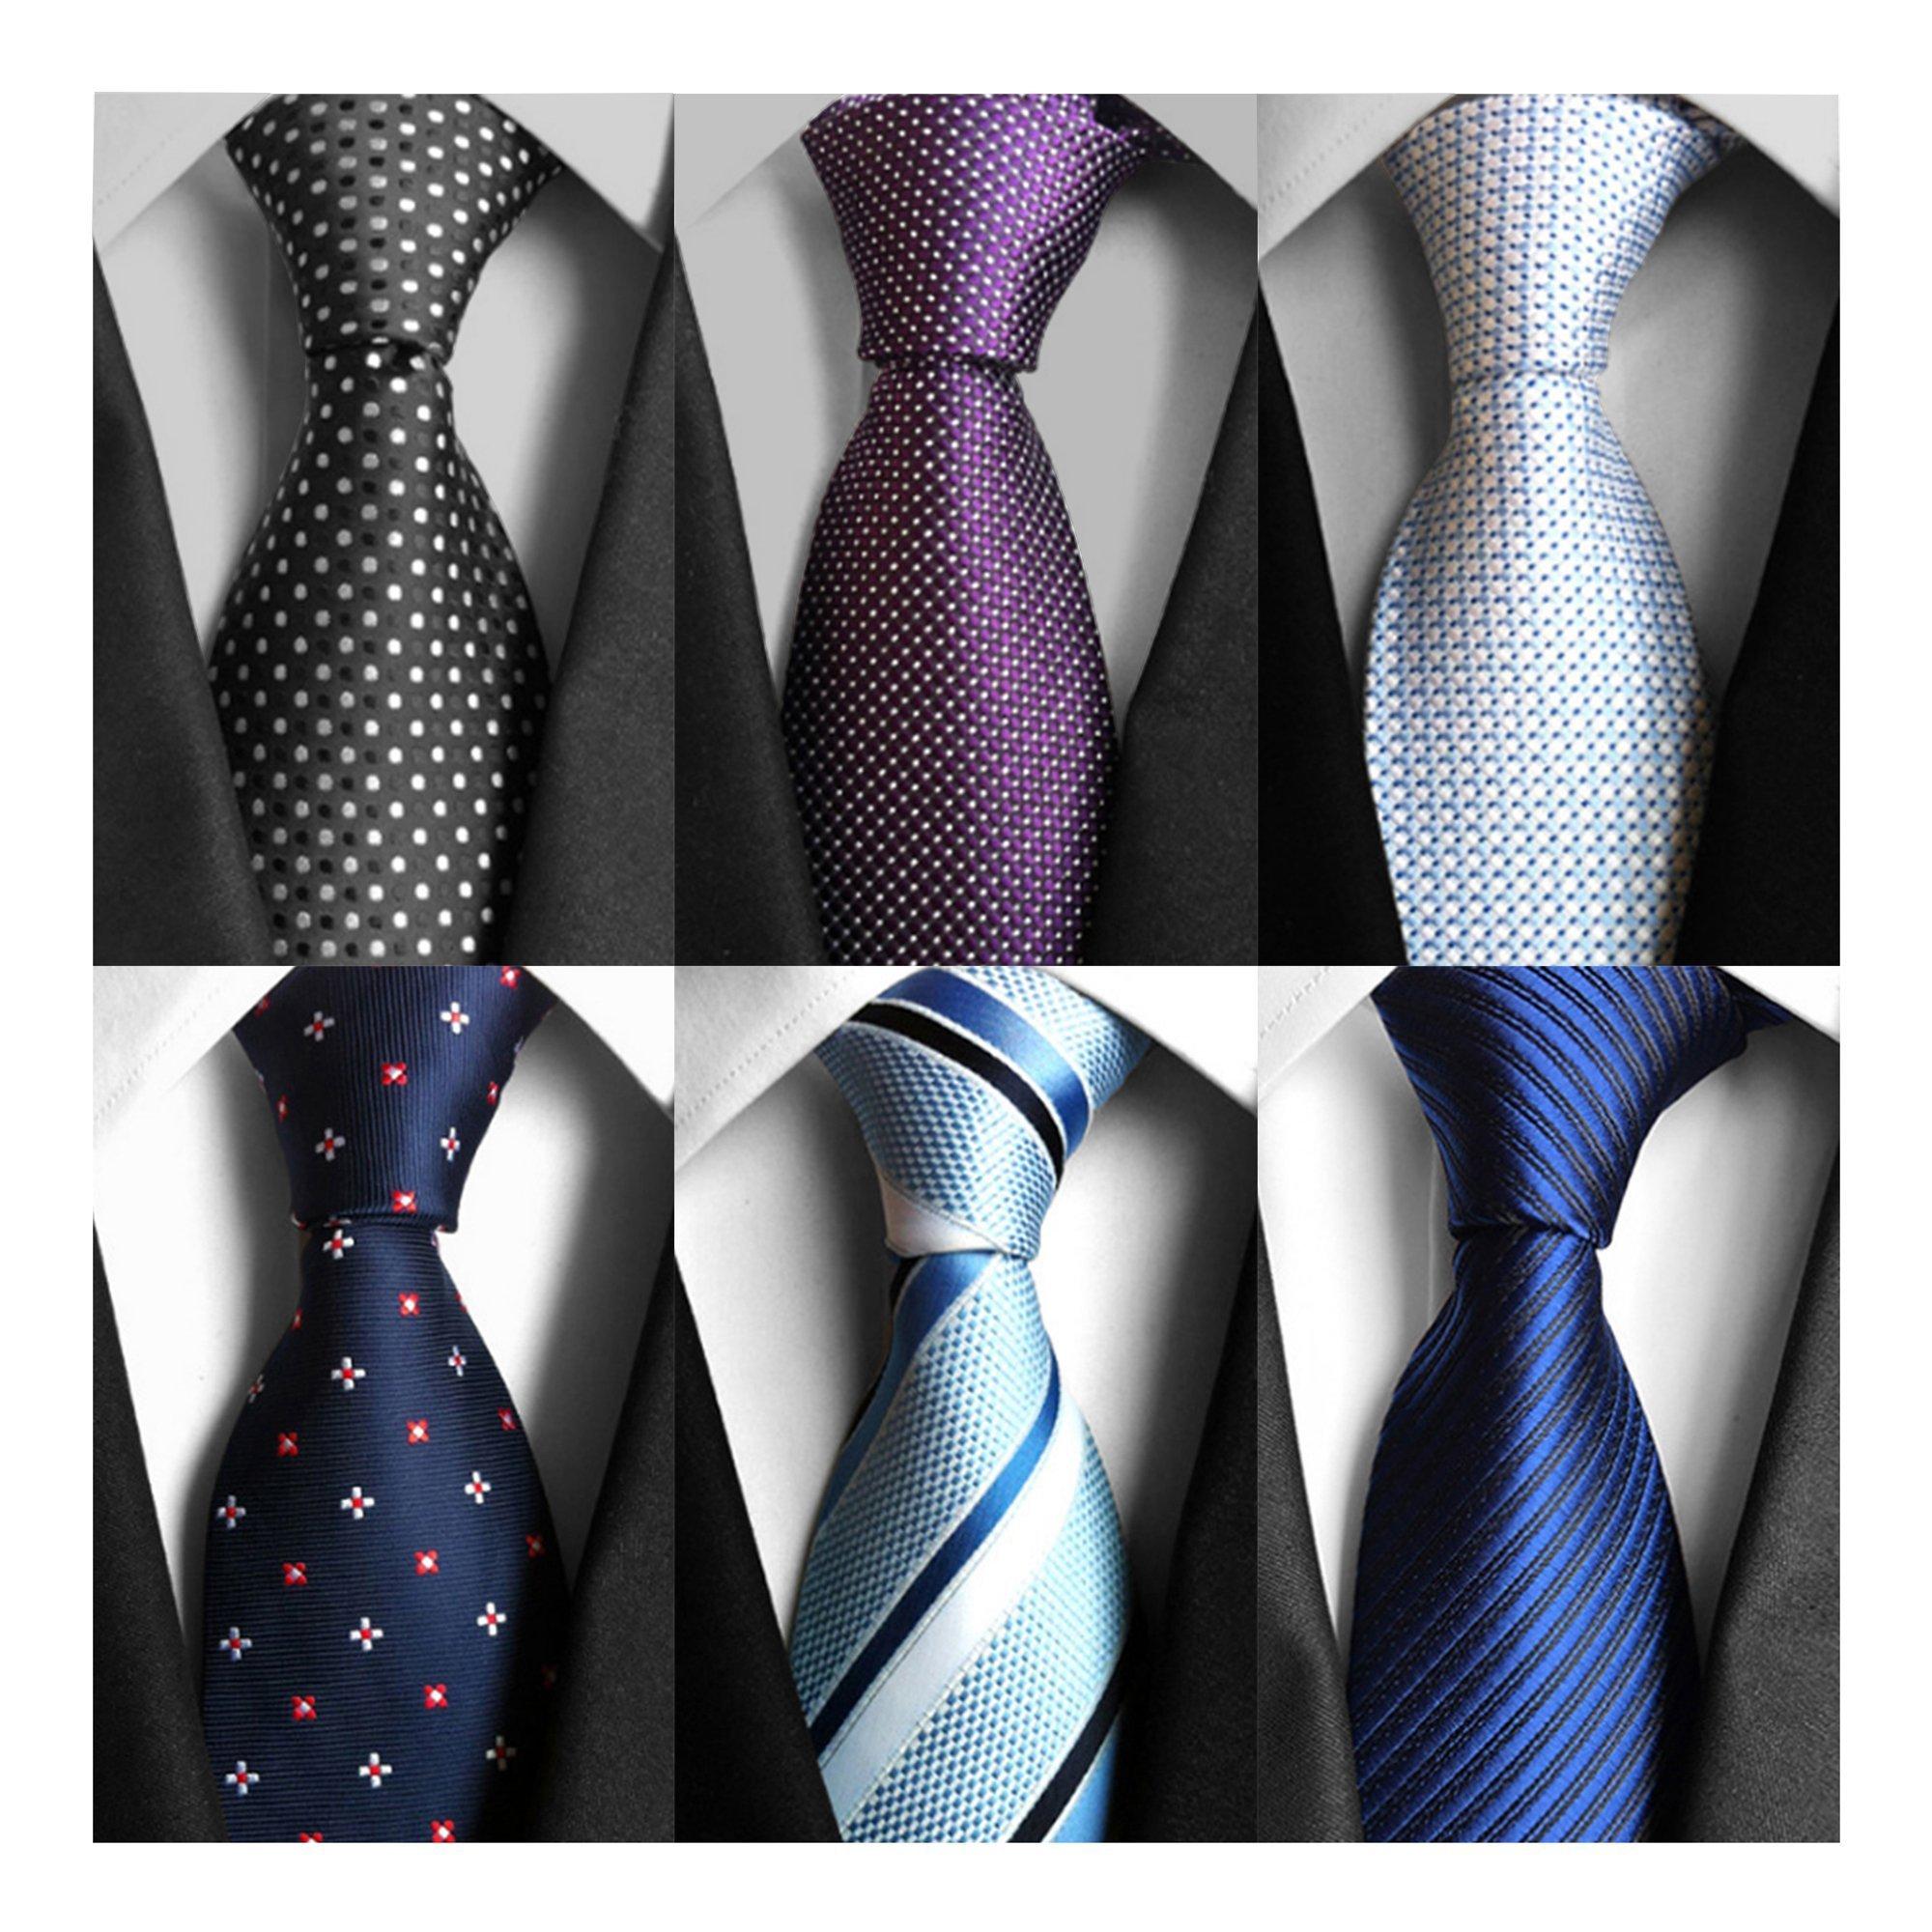 AVANTMEN 6 PCS Classic Men's Neckties Woven Jacquard Neck Ties Set (S10)